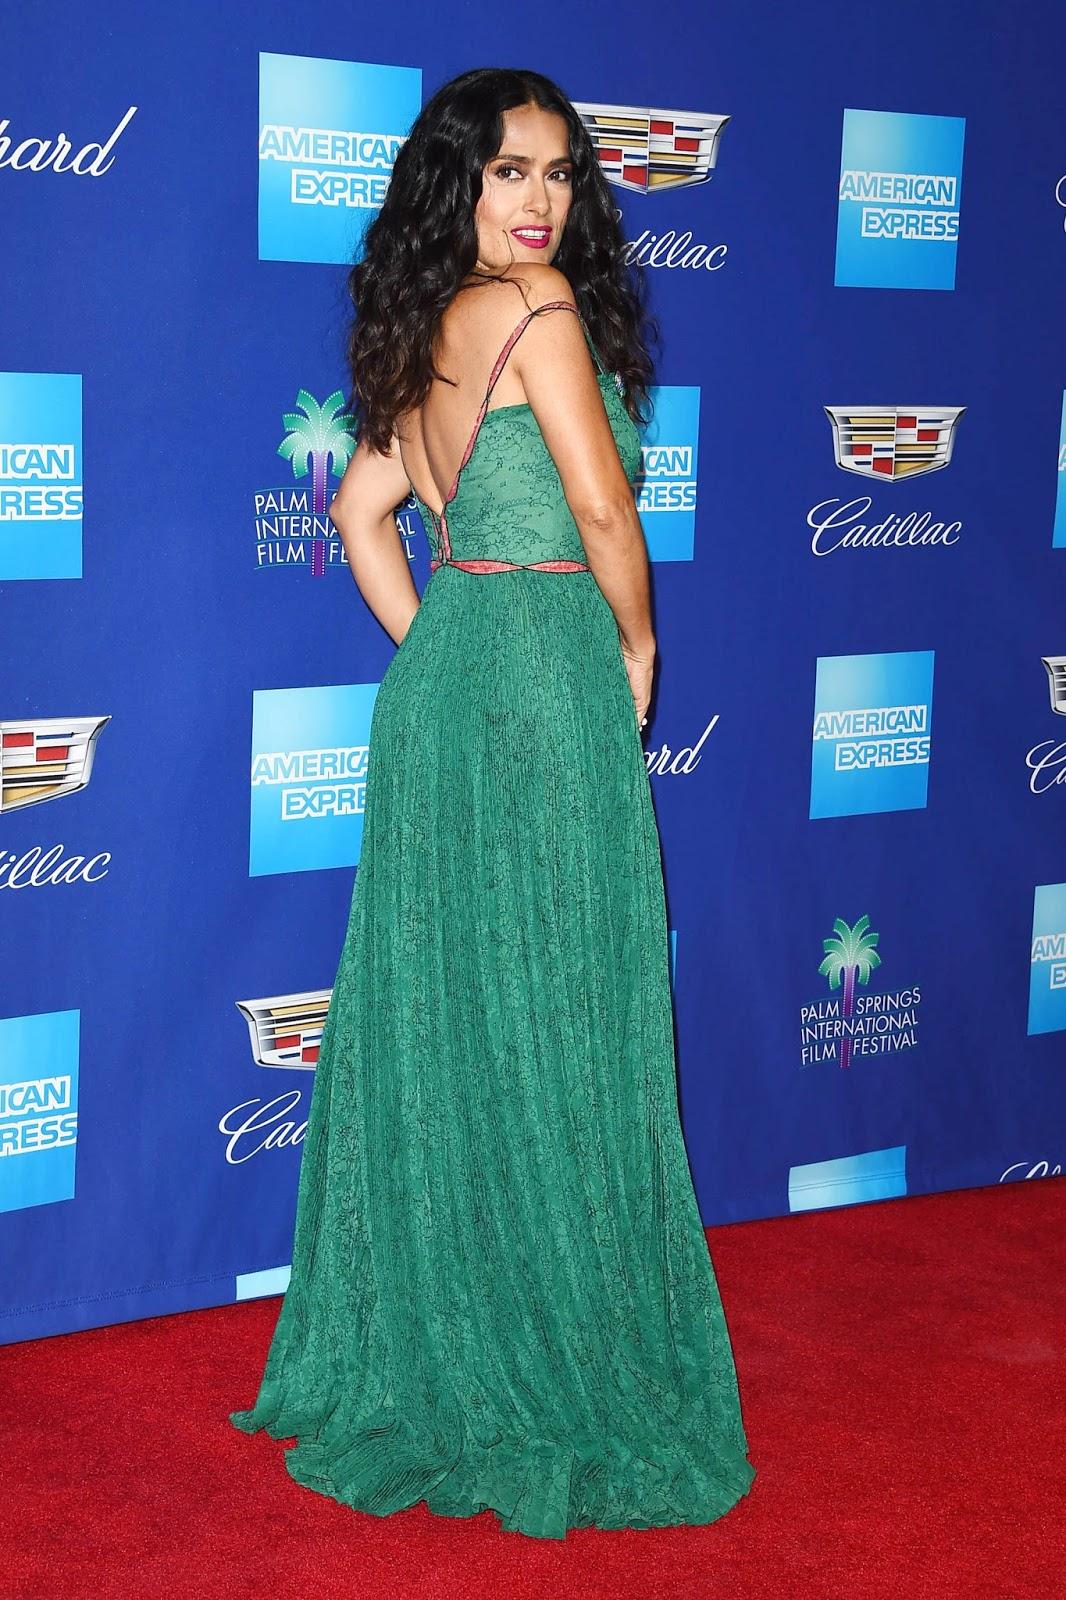 Salma Hayek Posing at 29th Annual Palm Springs International Film Festival Awards Gala